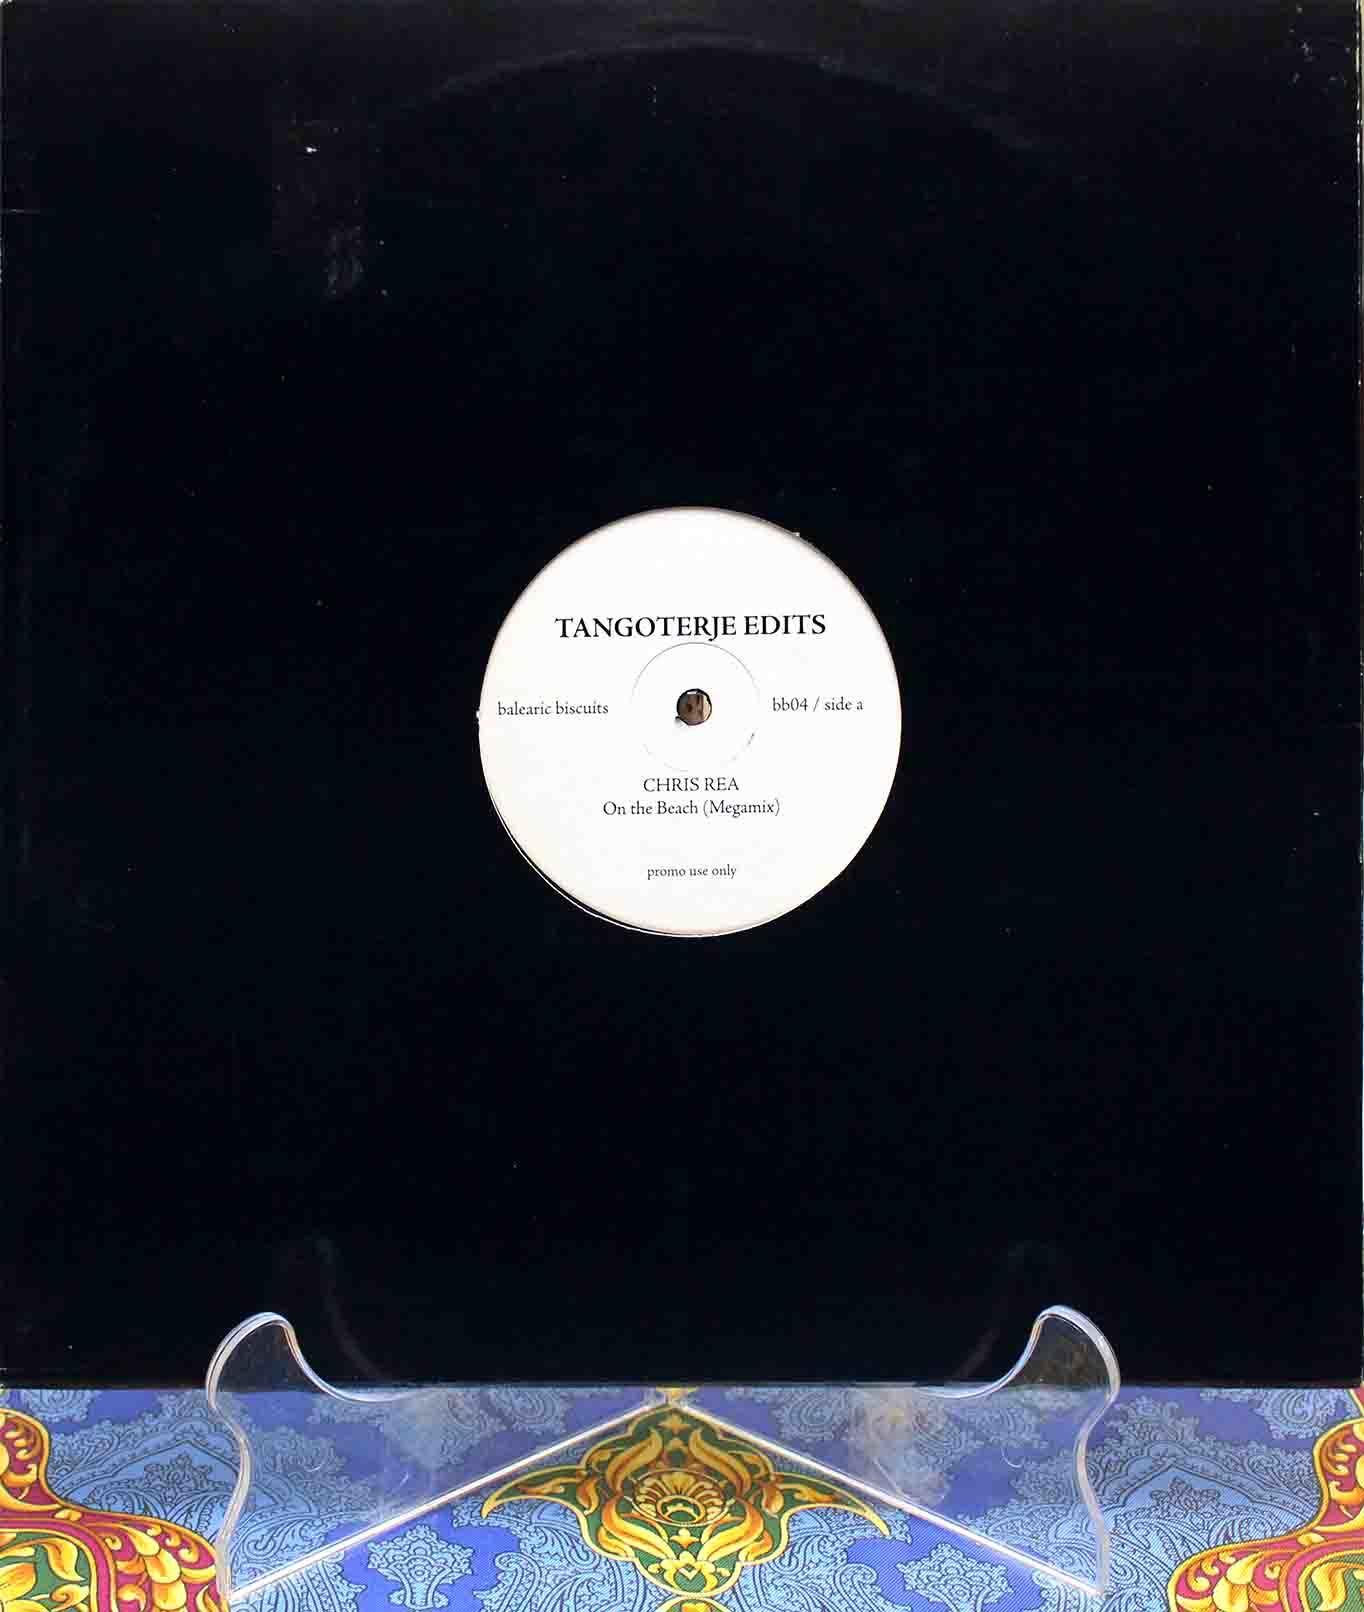 Chris Rea – On The Beach (Tangoterje Megamix) 01